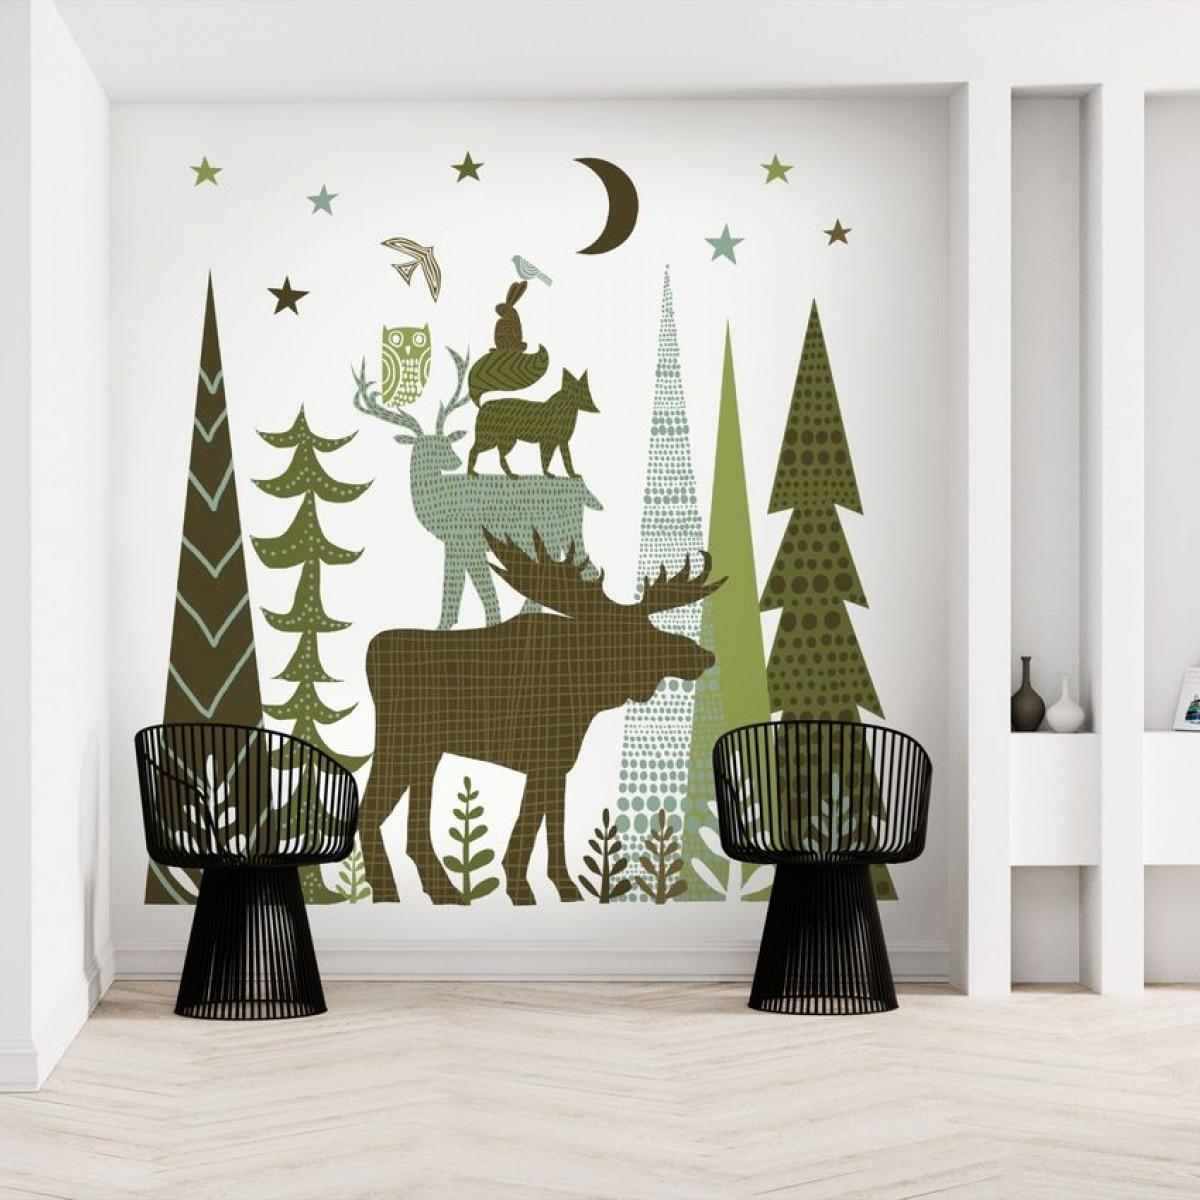 Fototapet Forest Folklore Green Animals 2, personalizat, Photowall